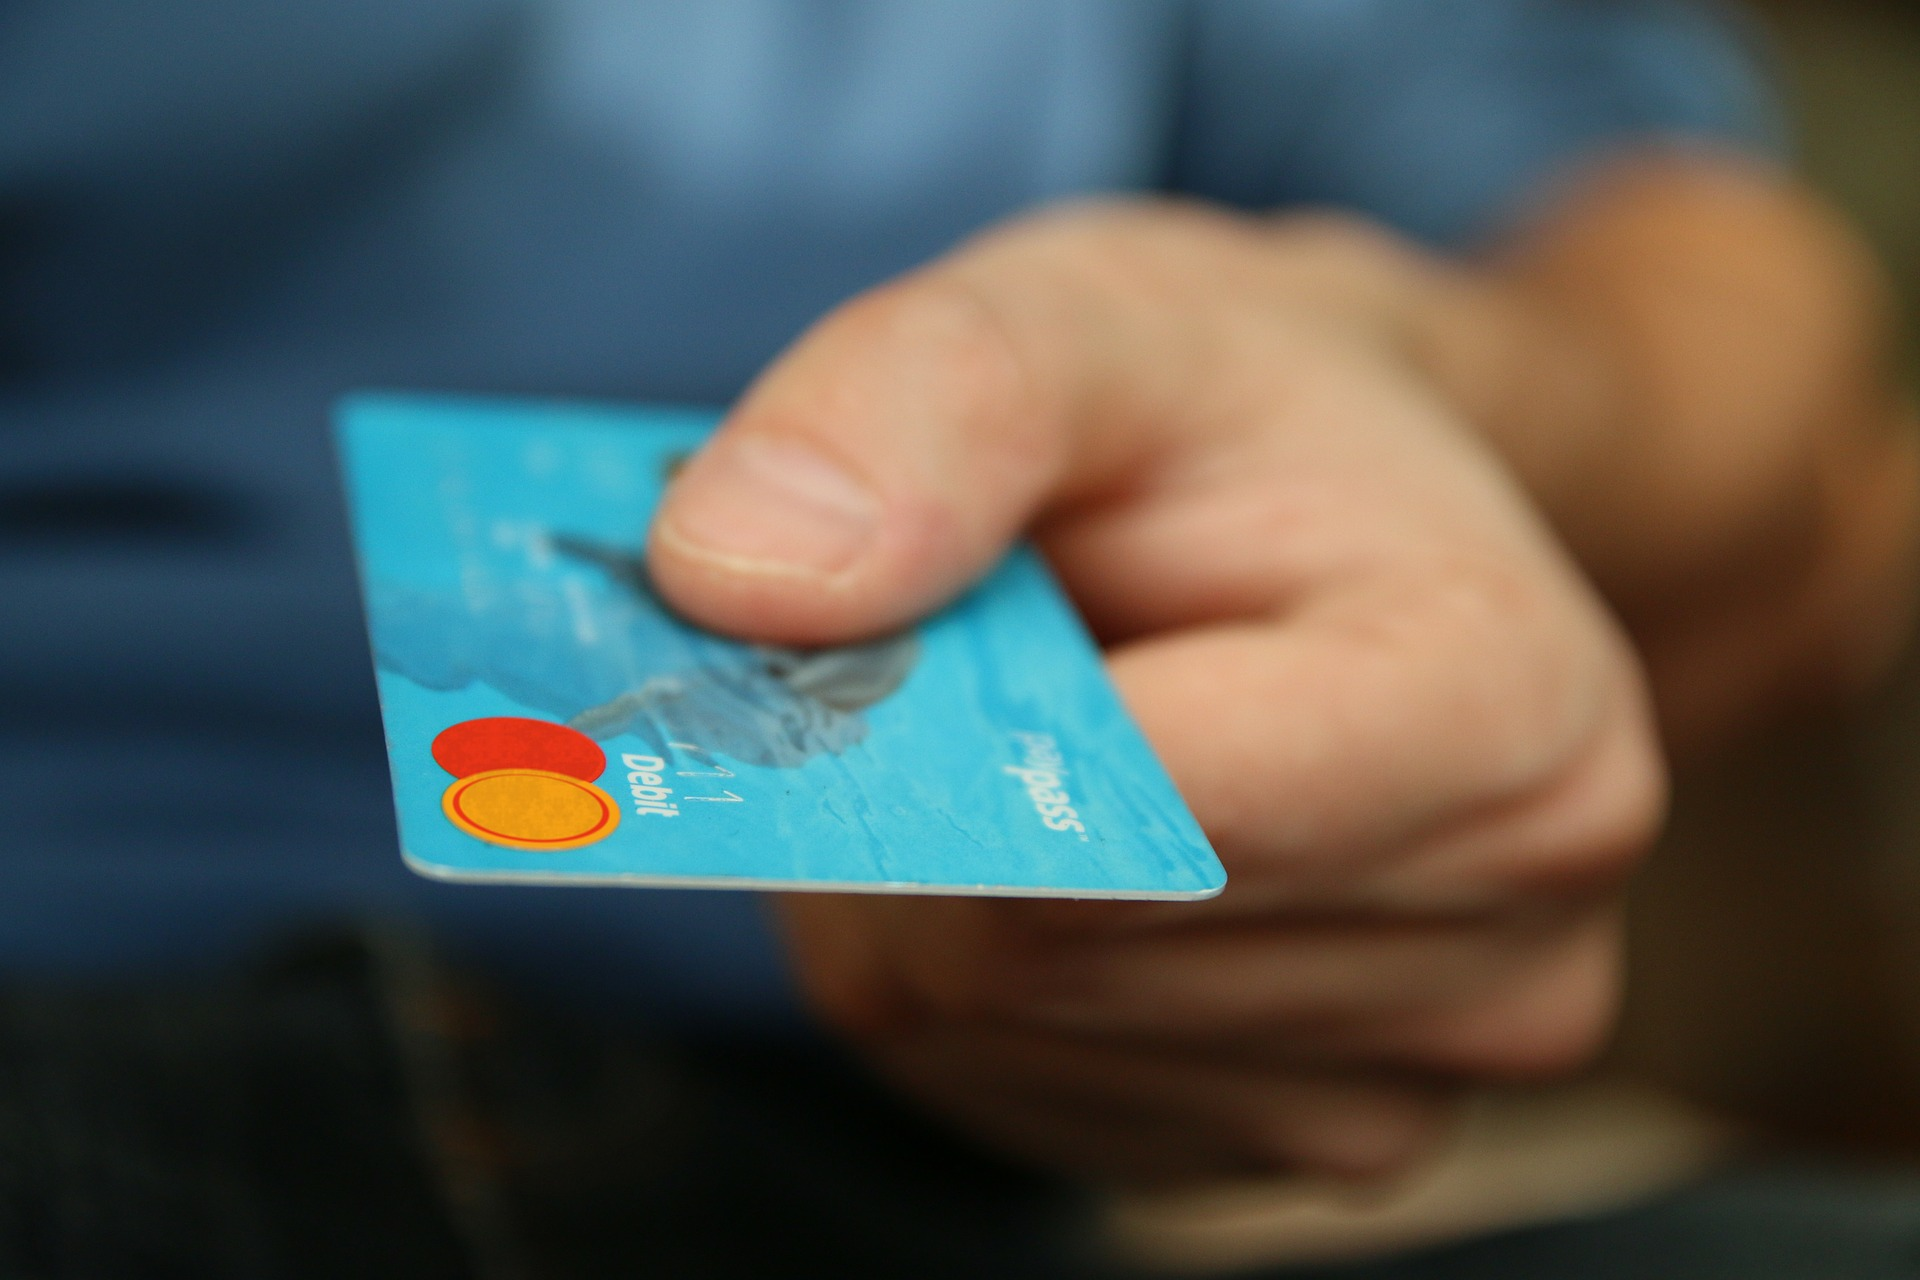 Kreditkarte beim Bezahlvorgang